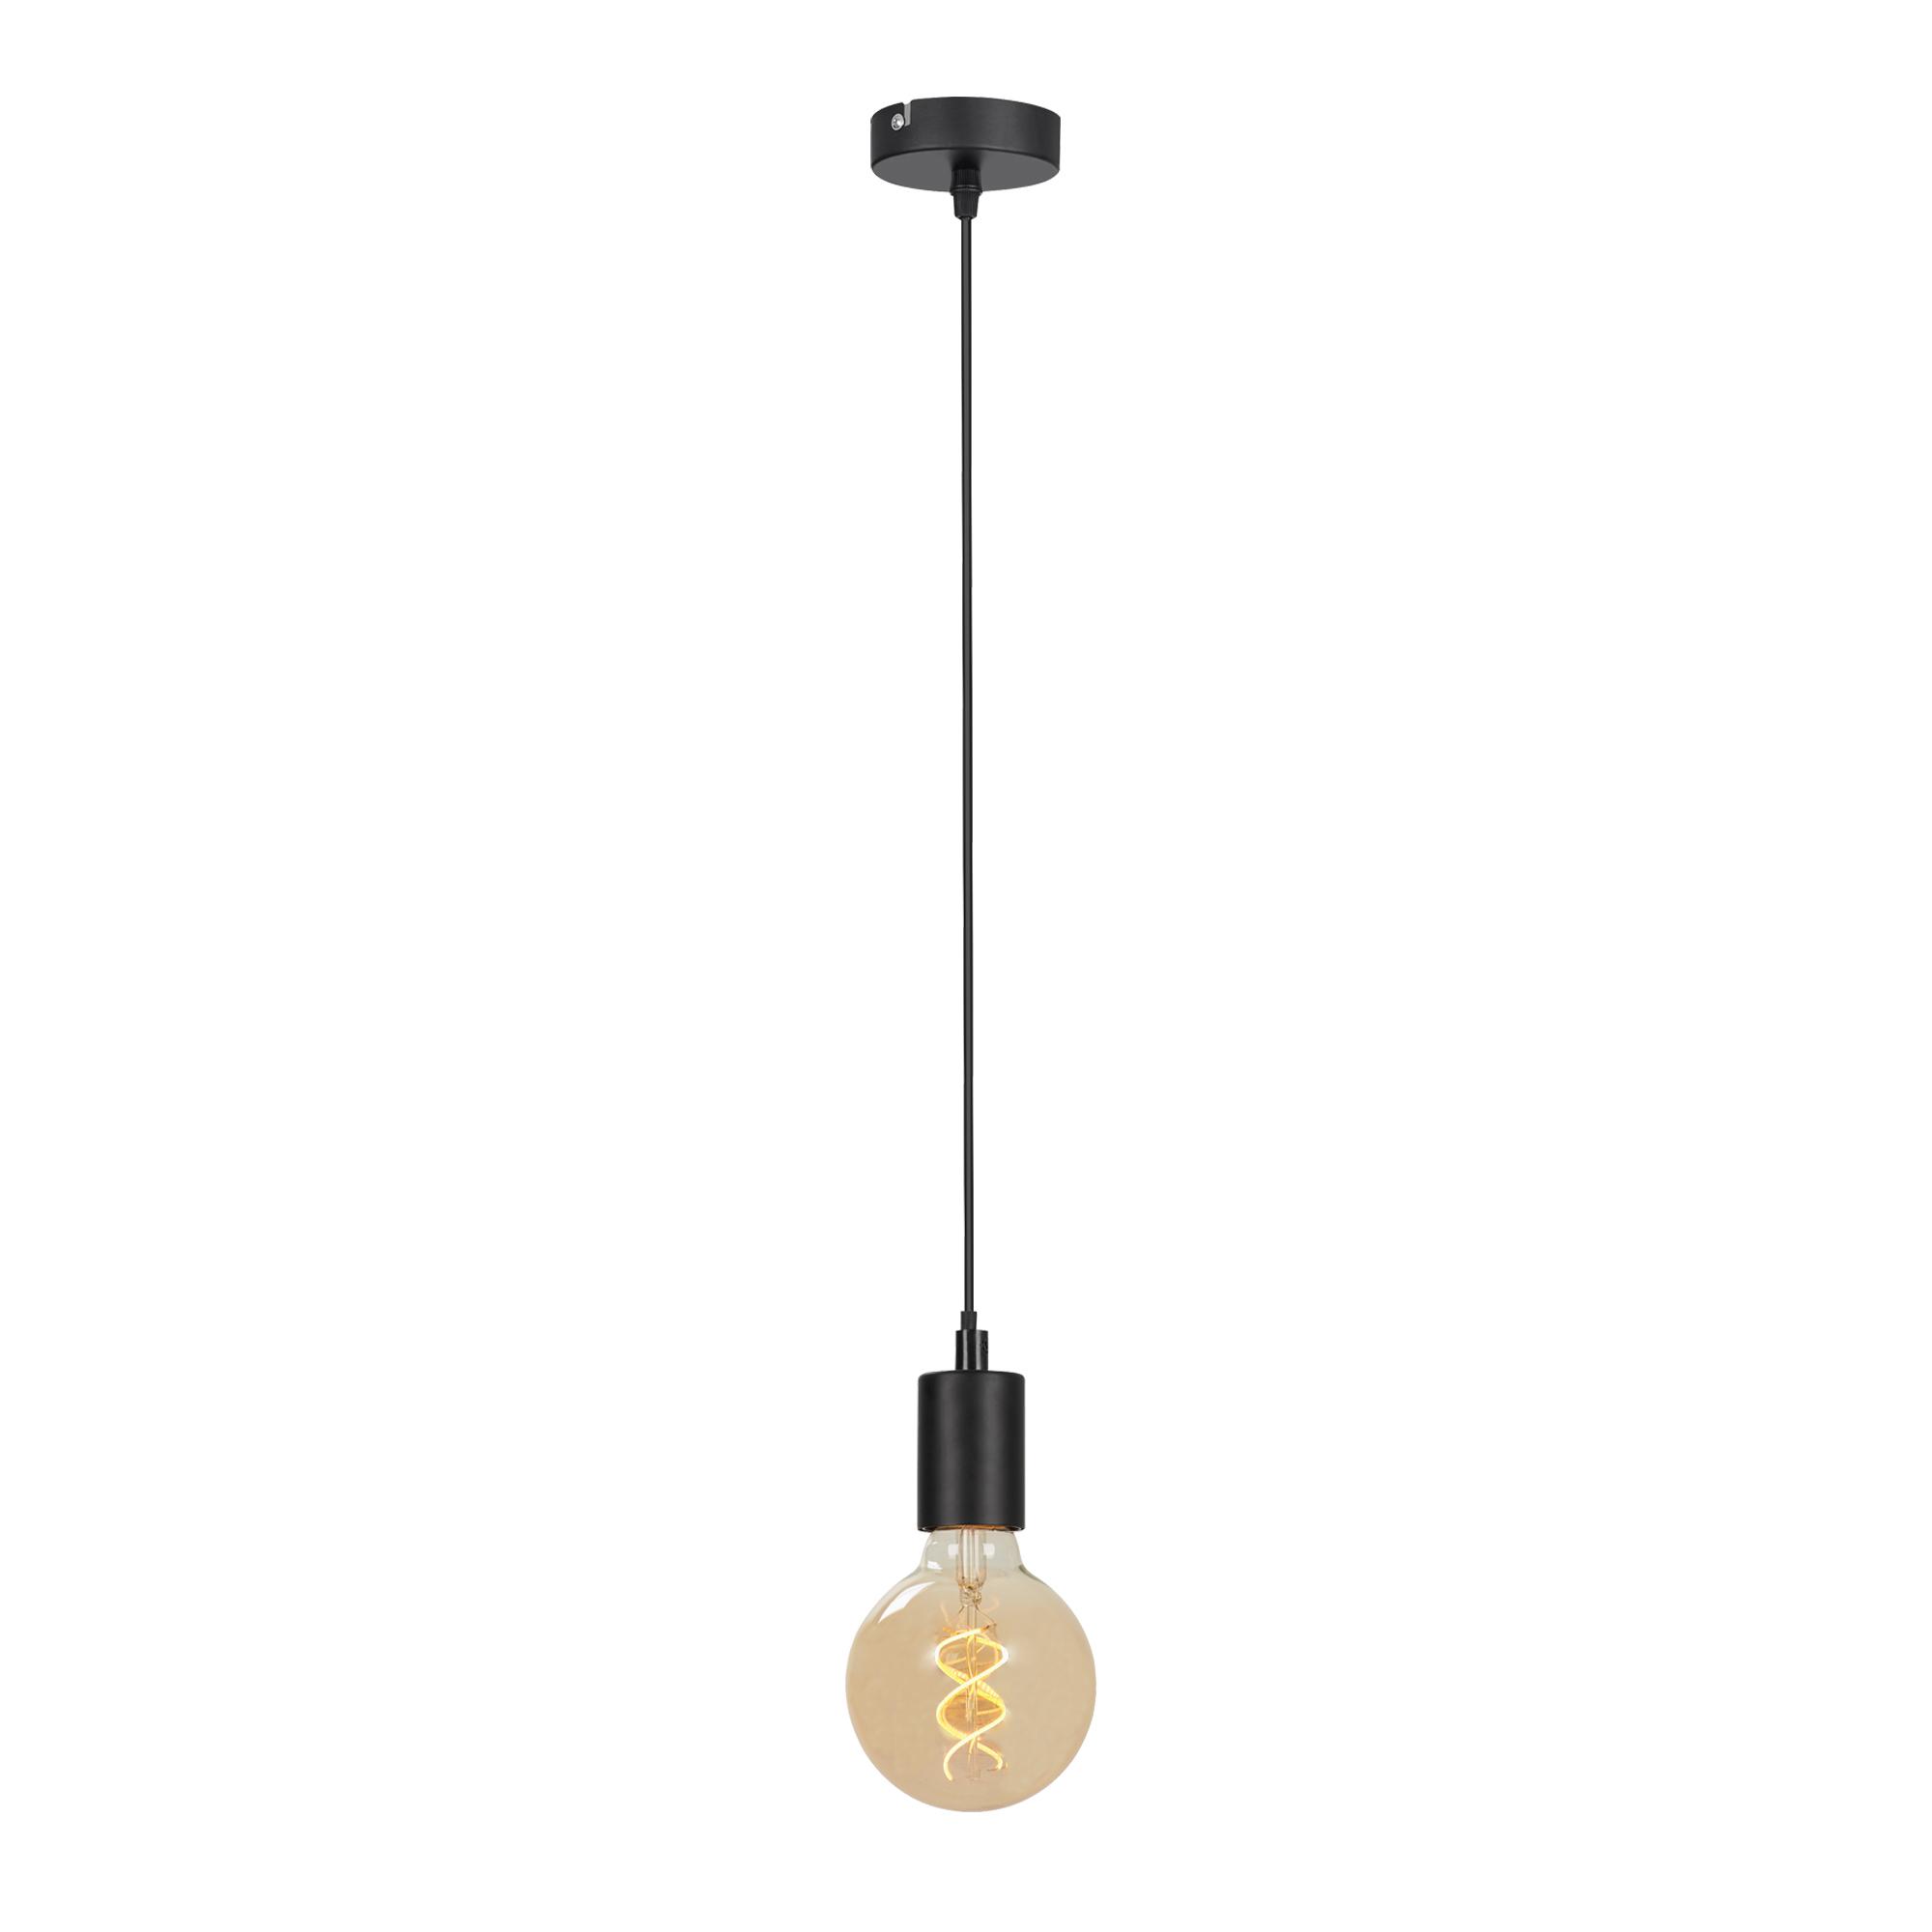 LED Pendelleuchte, 110 cm, max. 60 W, Schwarz